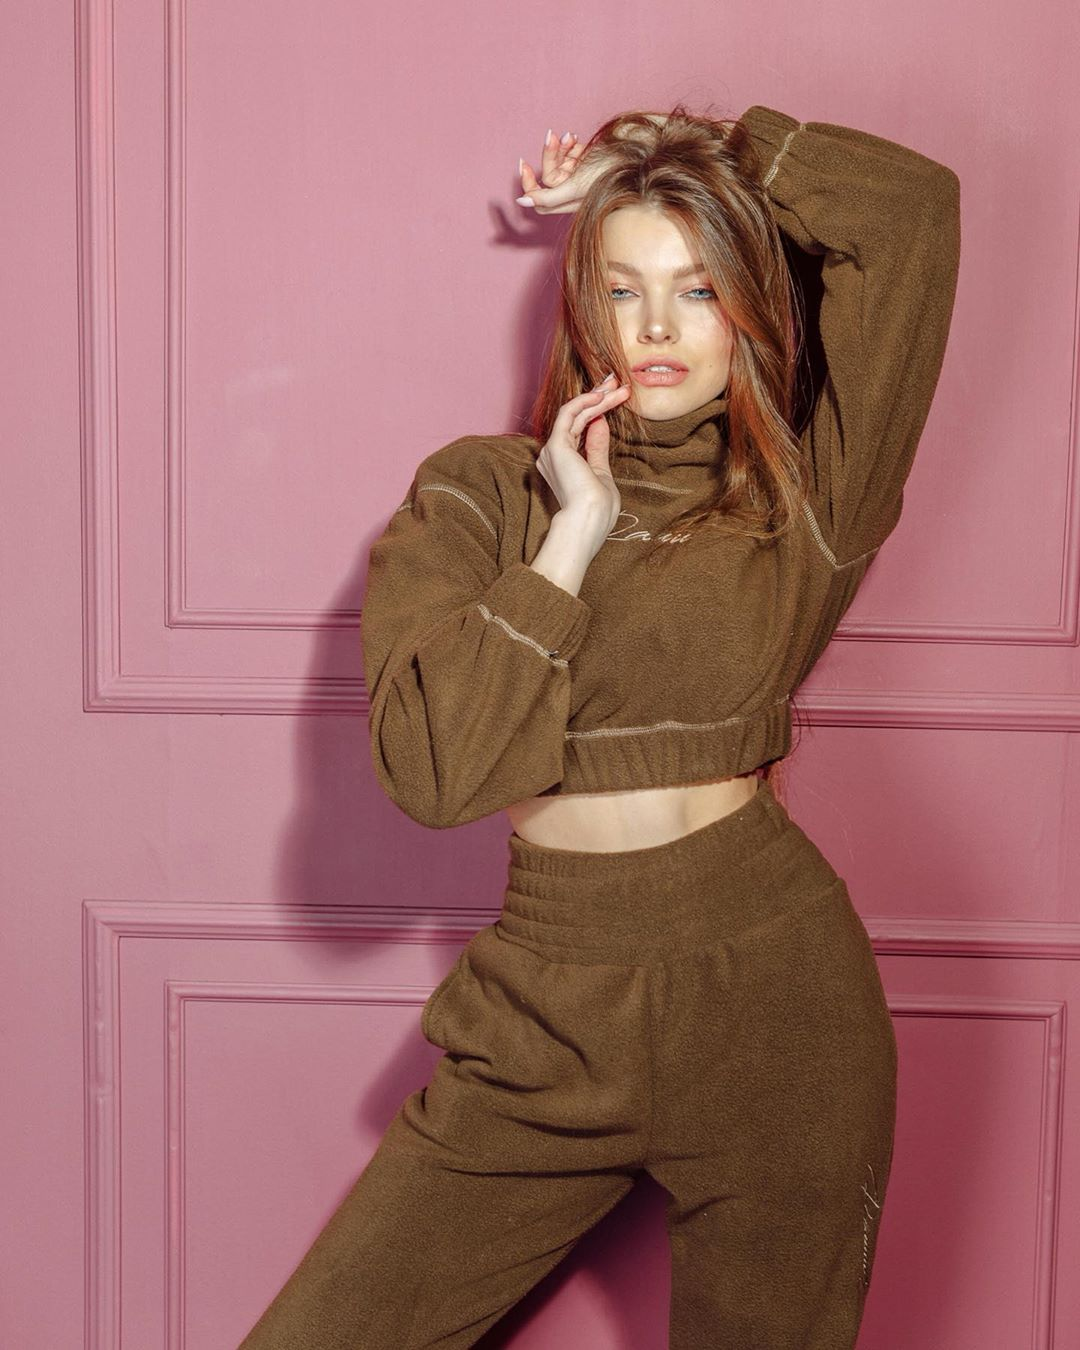 Veronika-Kysheleva-Wallpapers-Insta-Fit-Bio-7